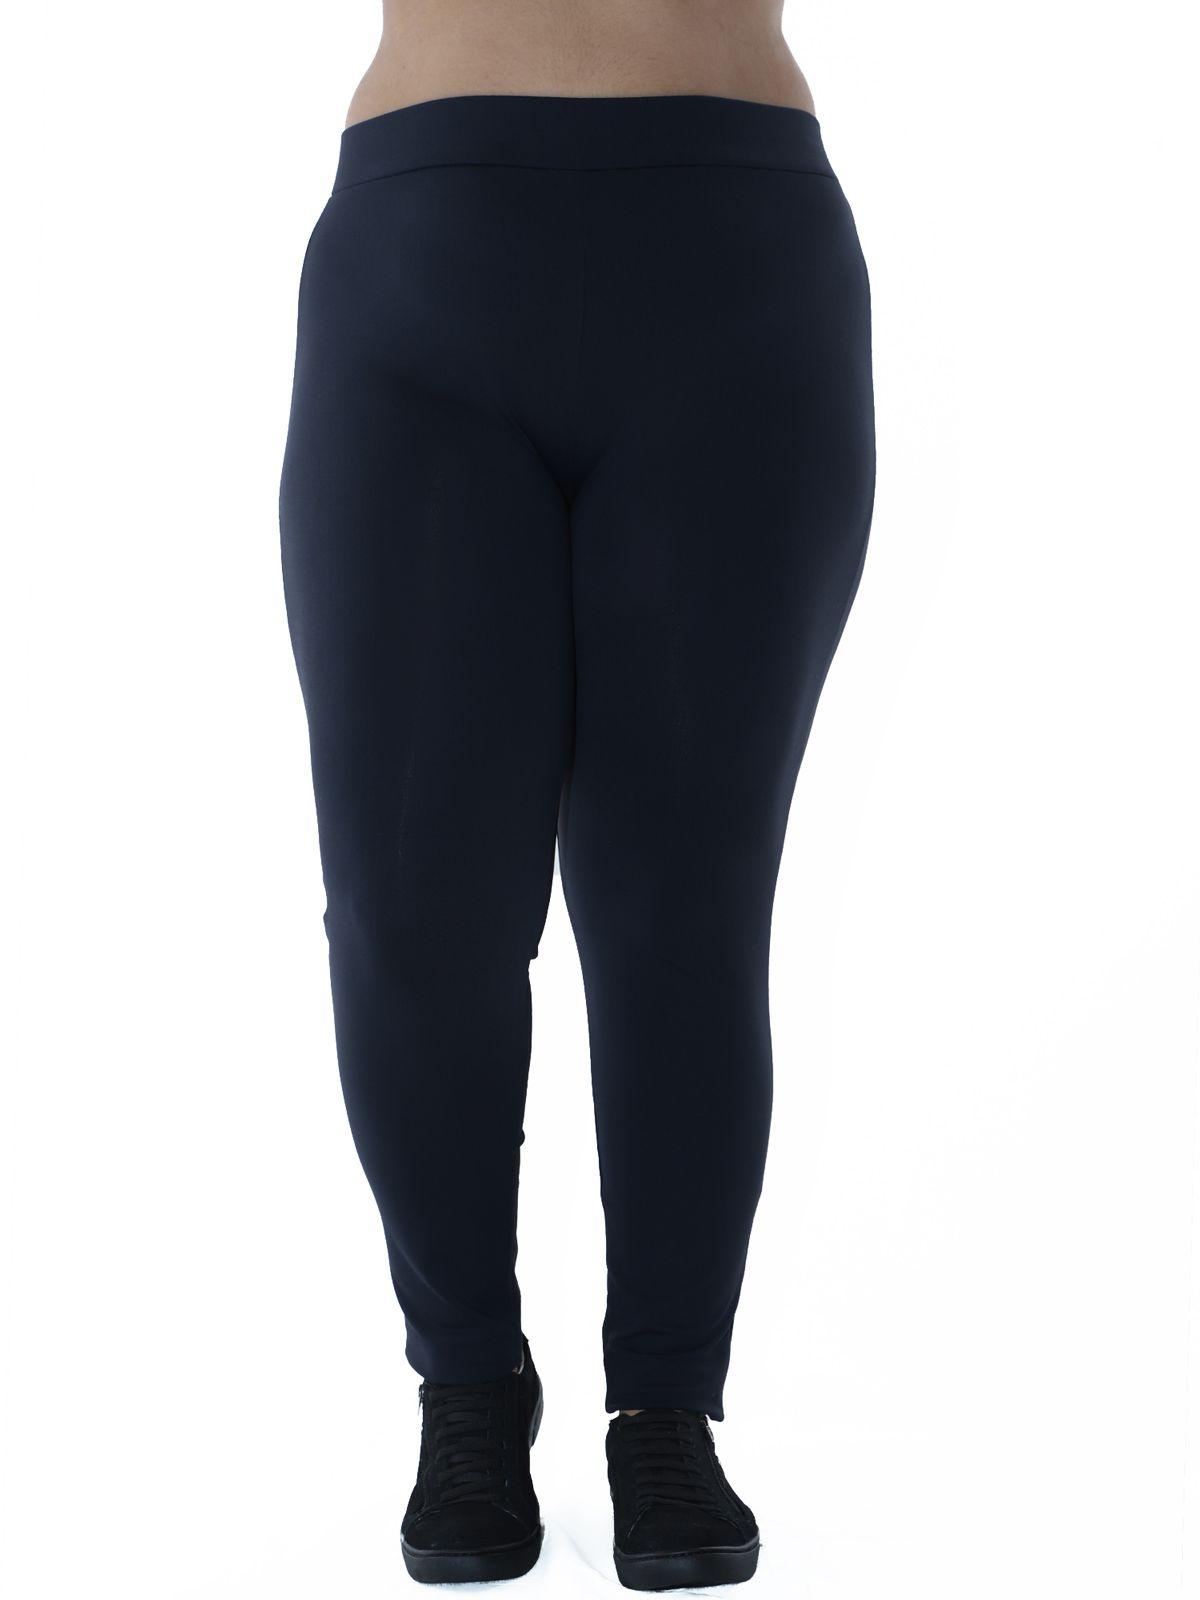 Calça Legging Plus Size Fitness KTS Preto